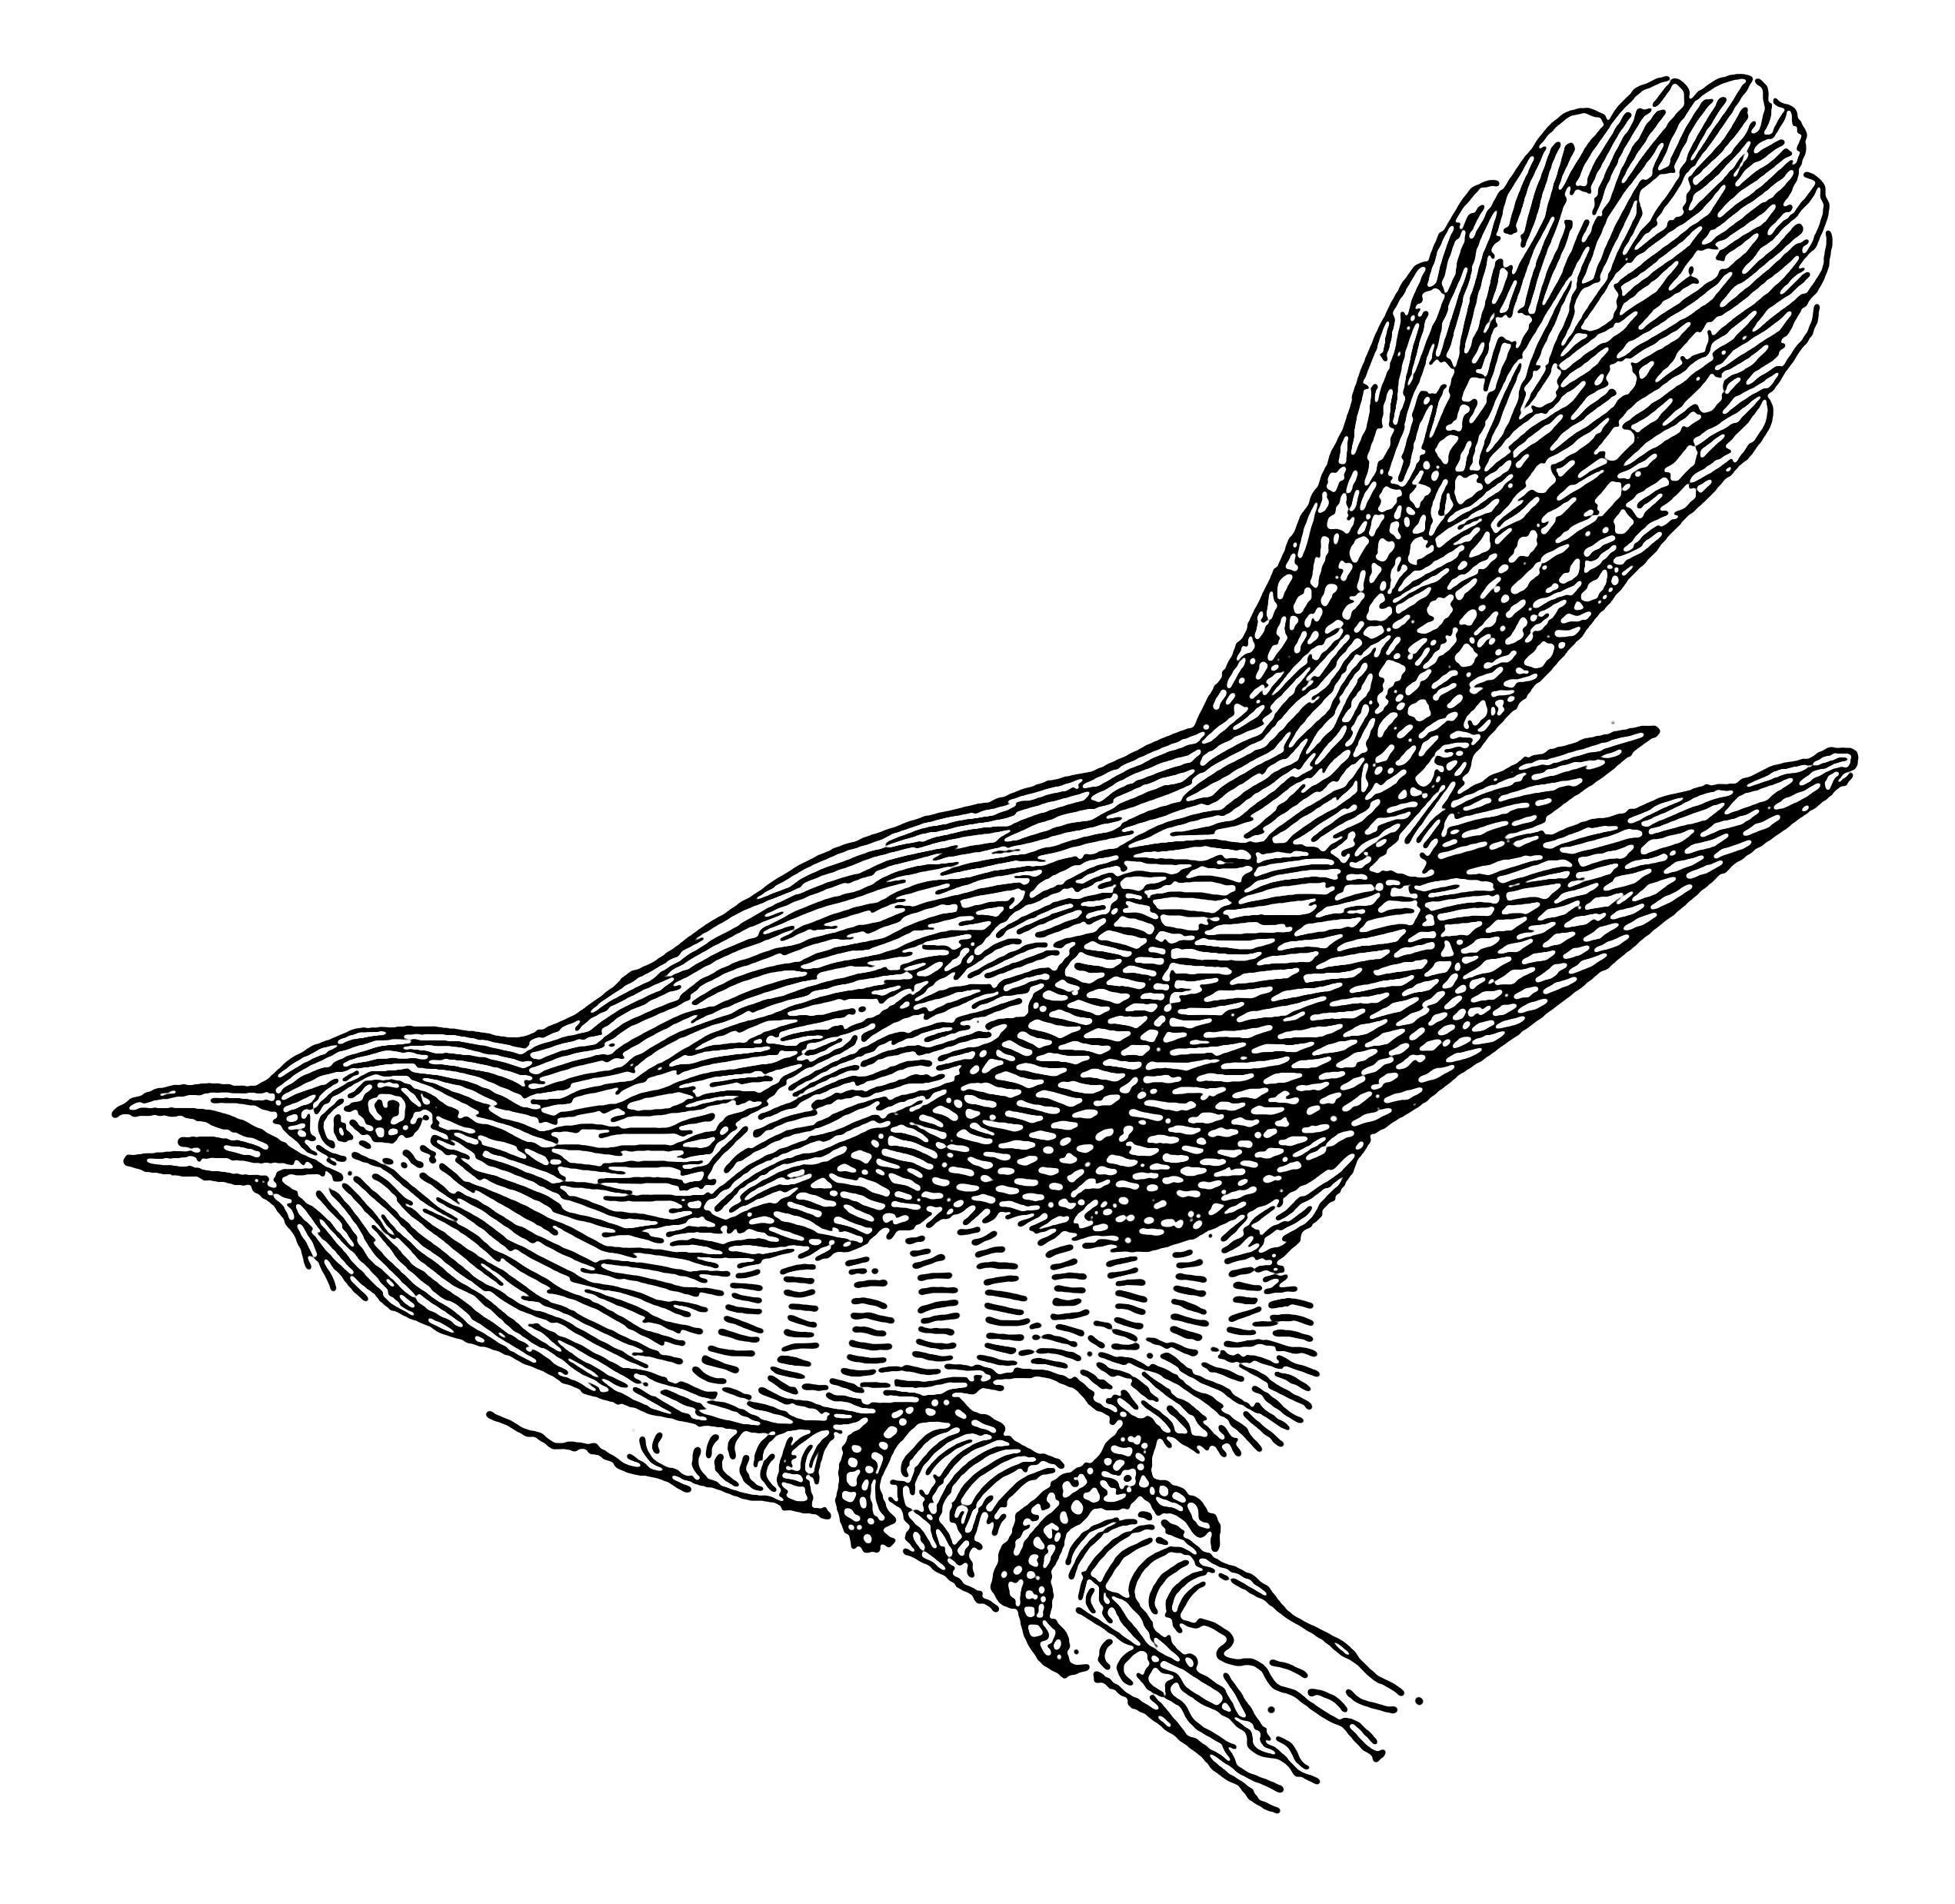 2542x2476 Filecuckoo (Psf).png